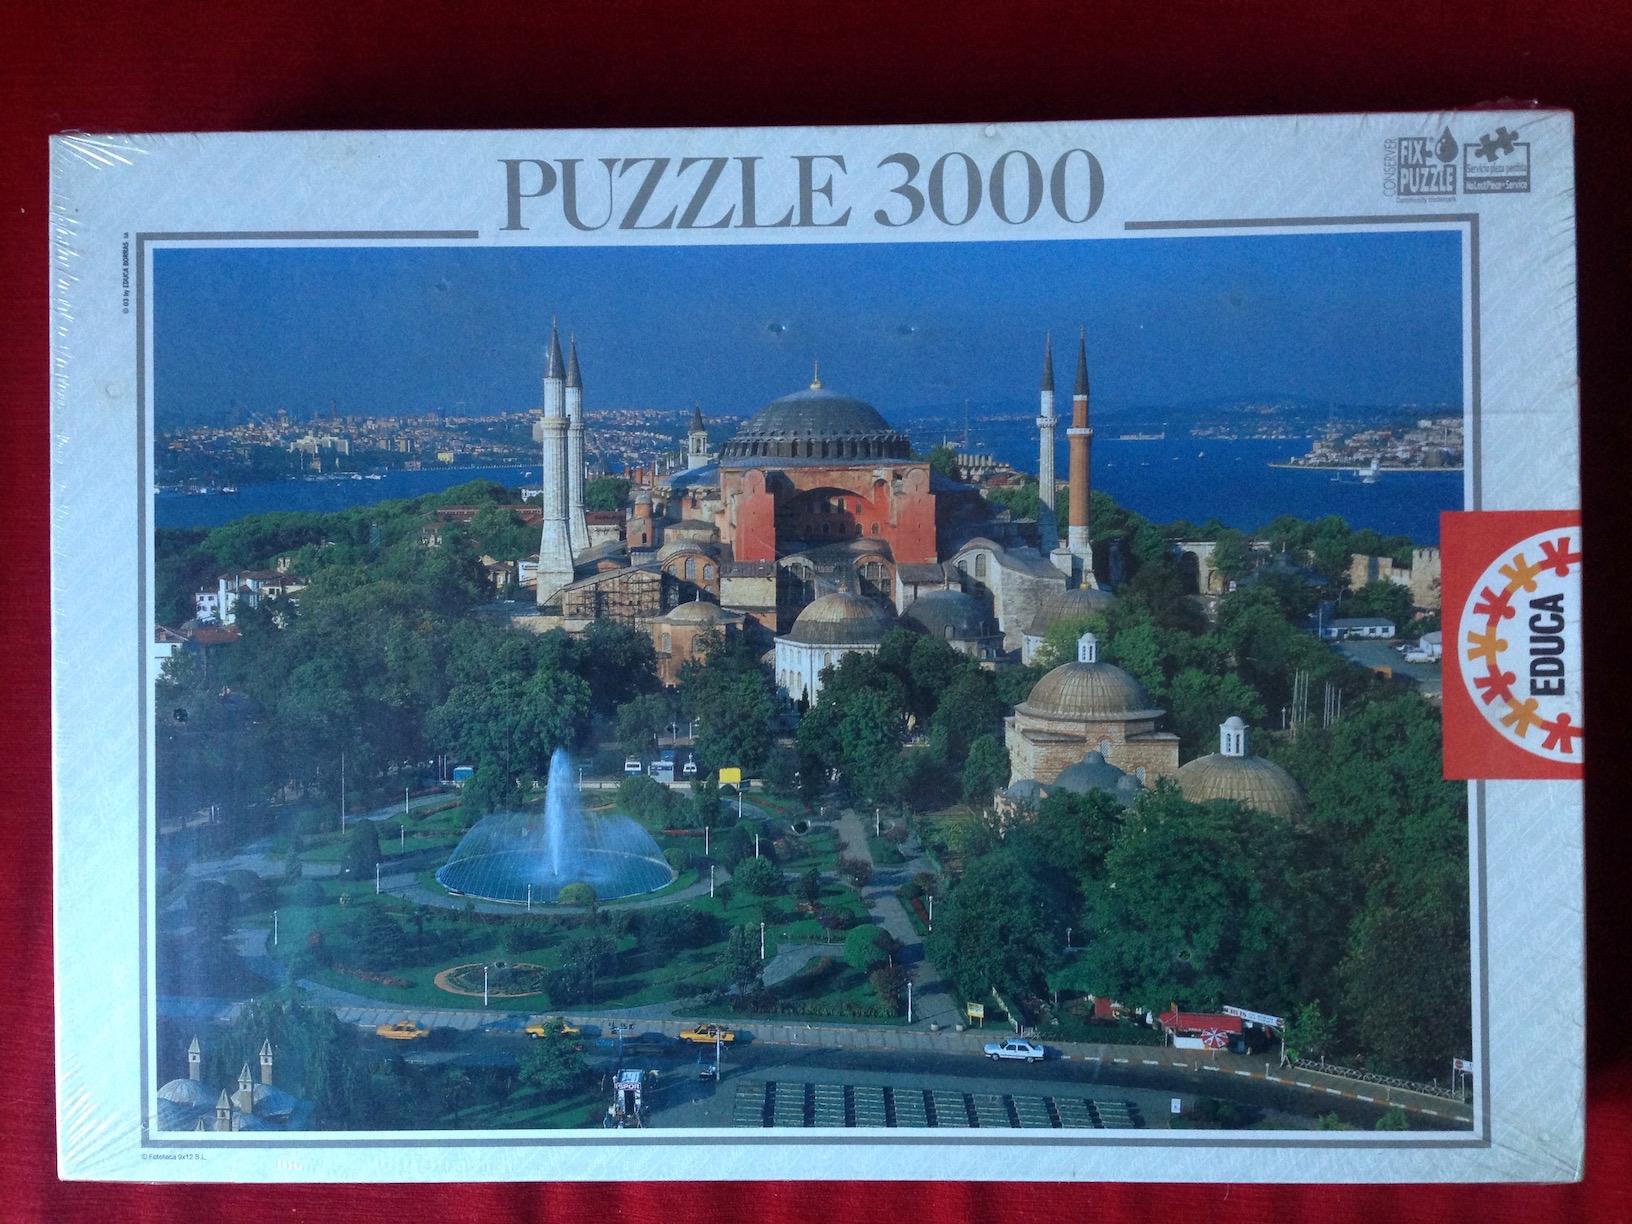 Image of the puzzle 3000, Educa, Istanbul, Turkey, Factory Sealed